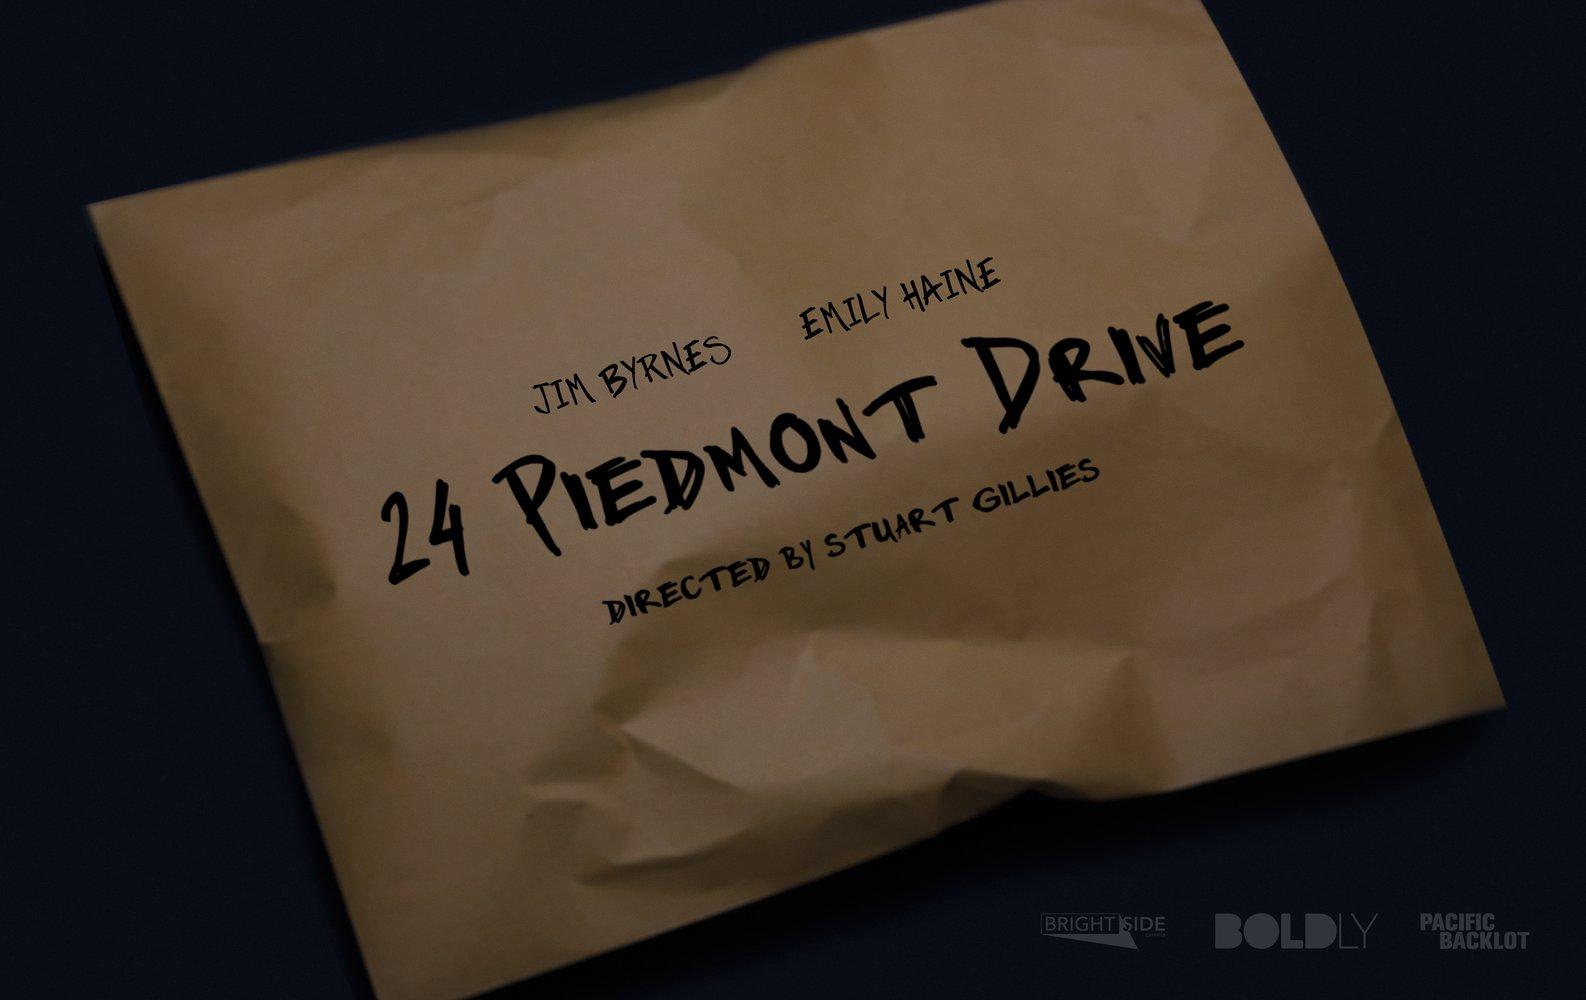 24 Piedmont Drive Cover Art Horizontal